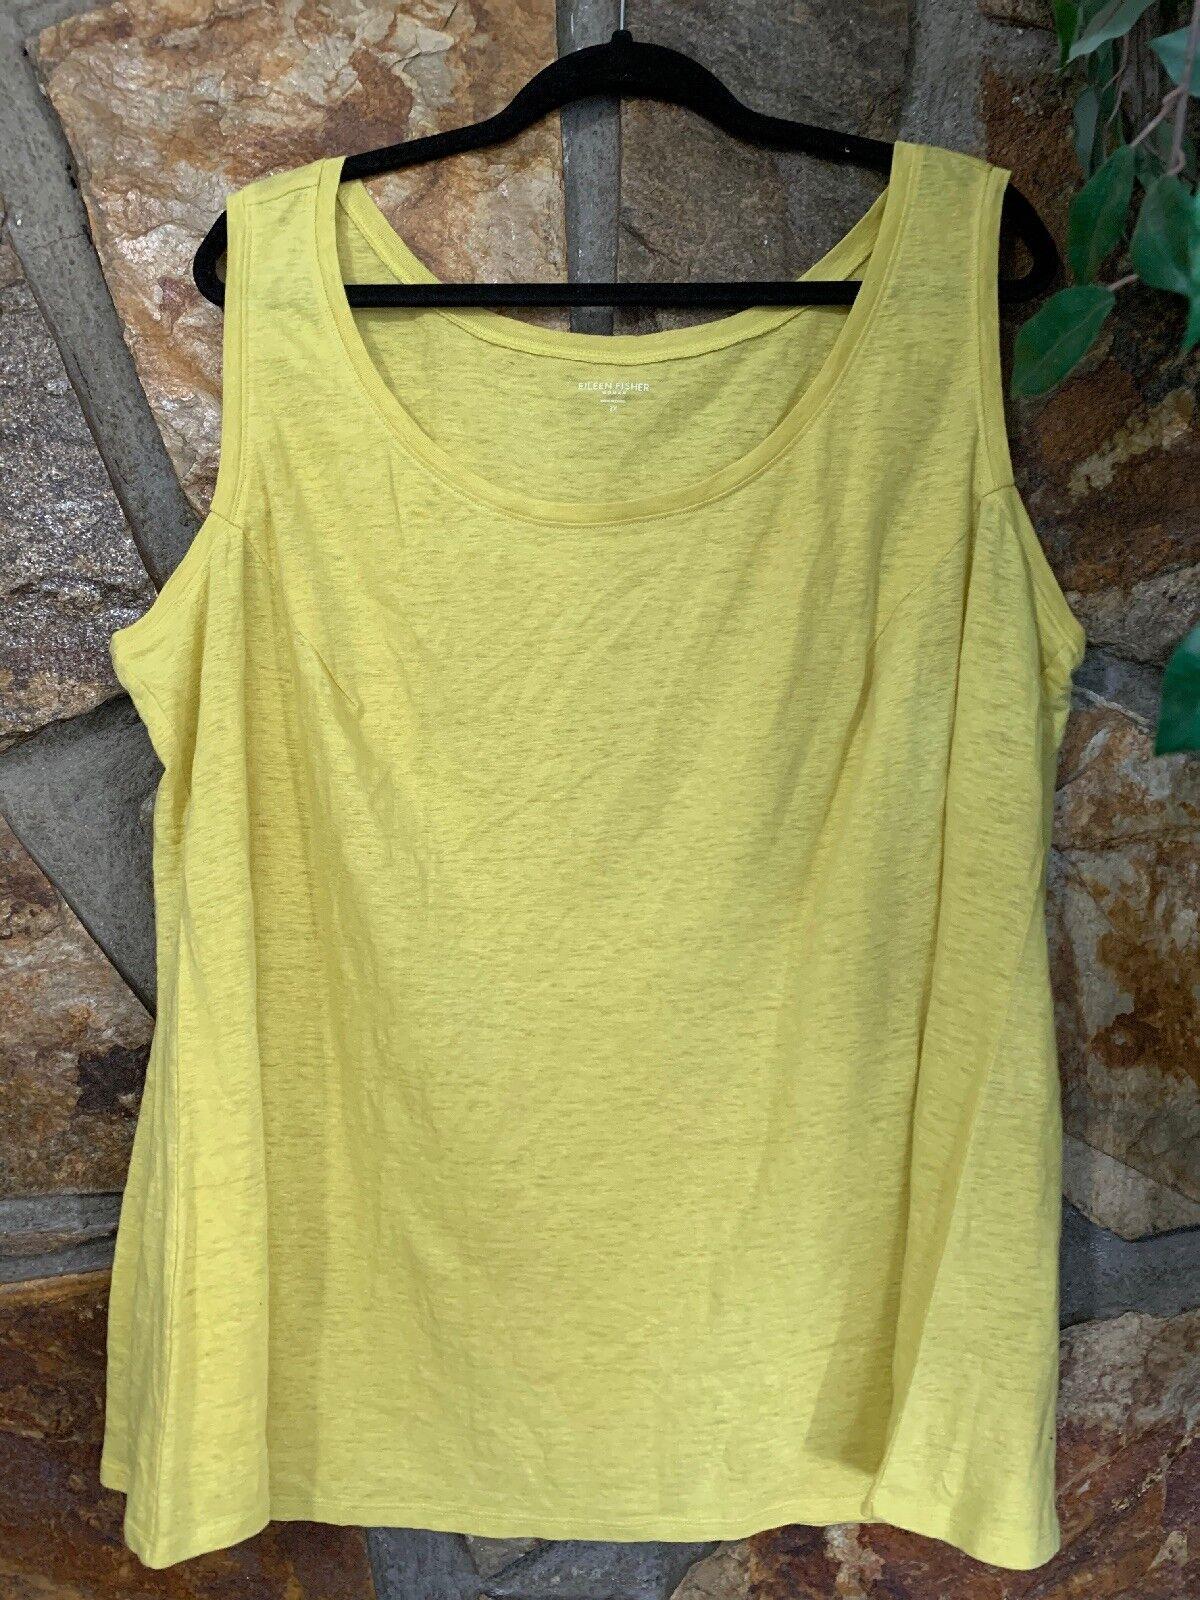 Eileen Fisher Woman 100% Linen Yellow Sleevess Tank Top Size 3X (E2)